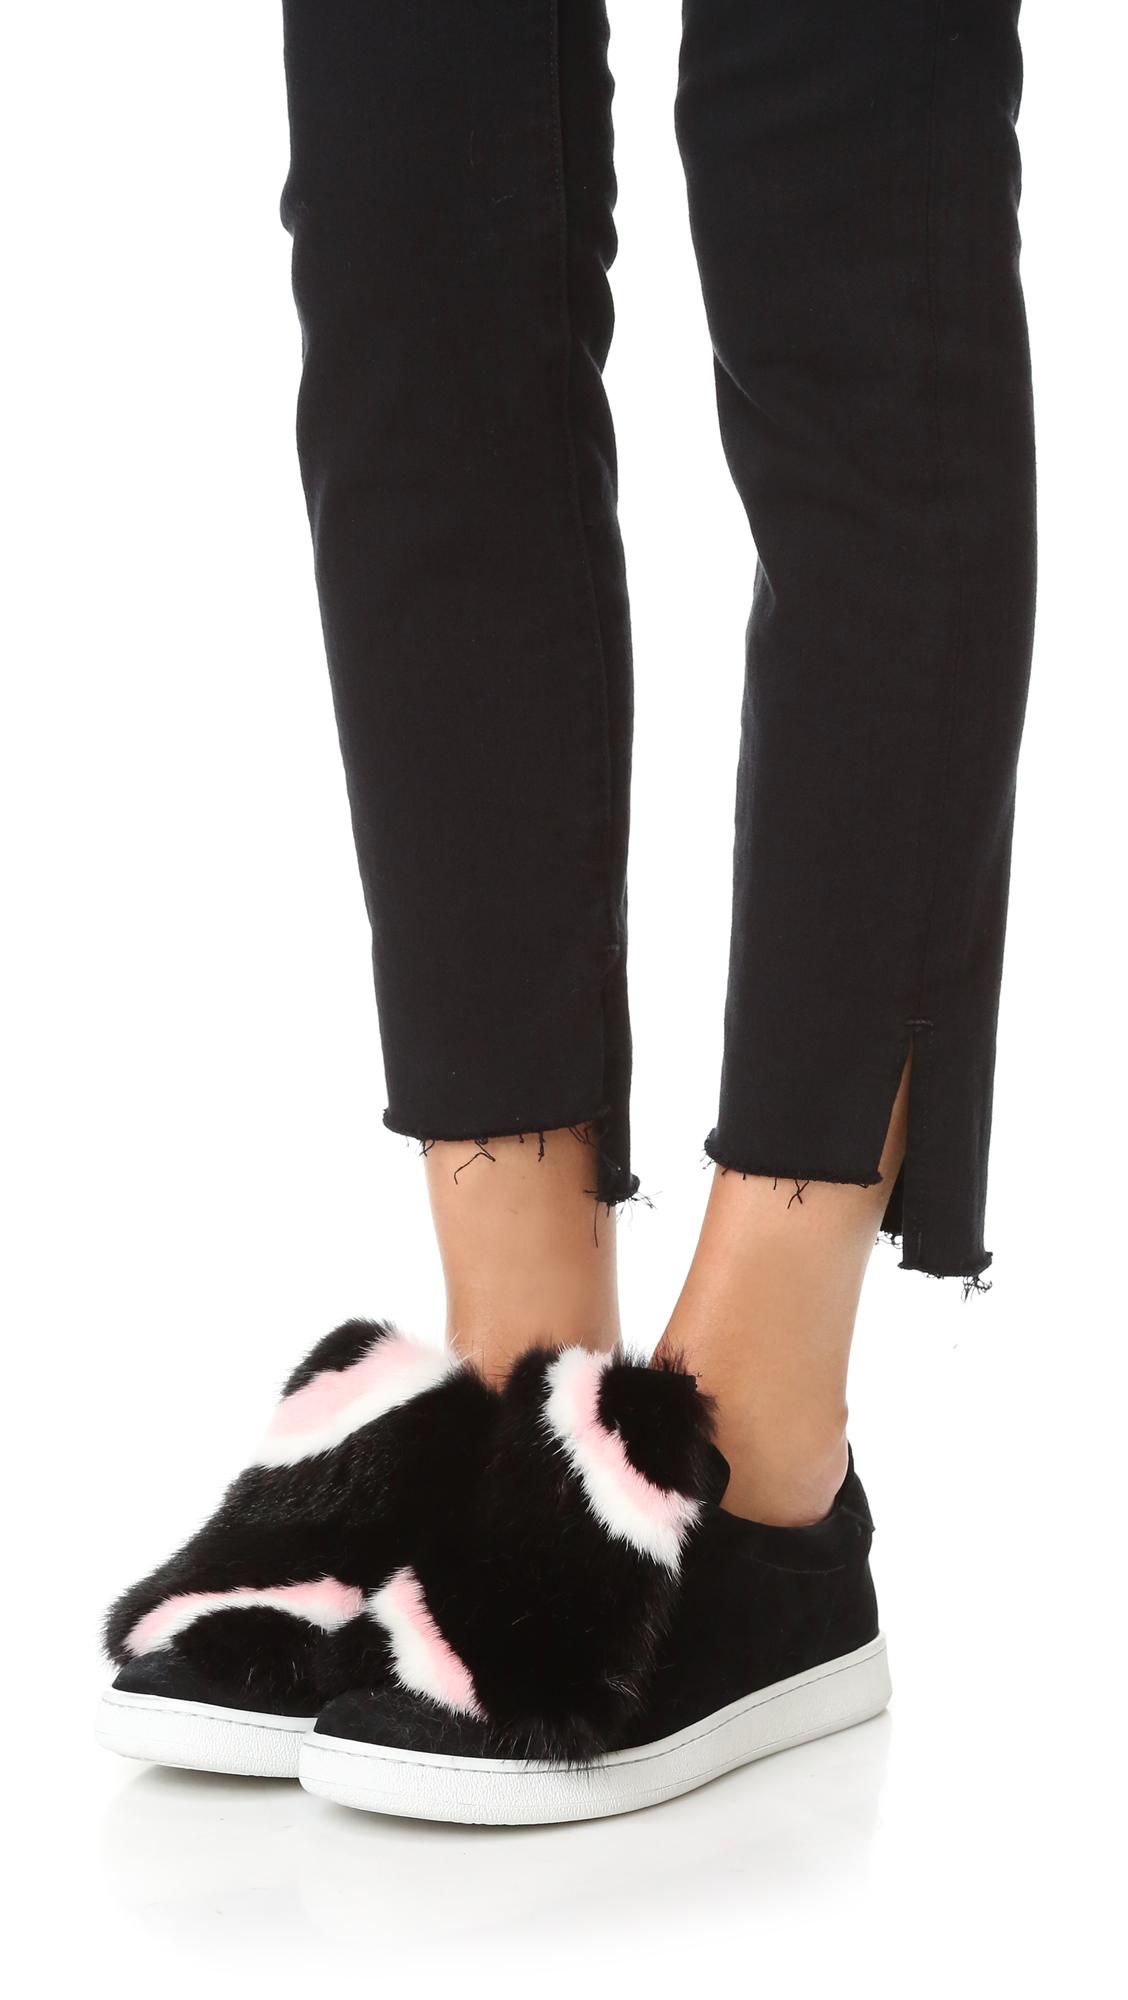 f447f83813 Joshua Sanders Fur Fringe Sneakers